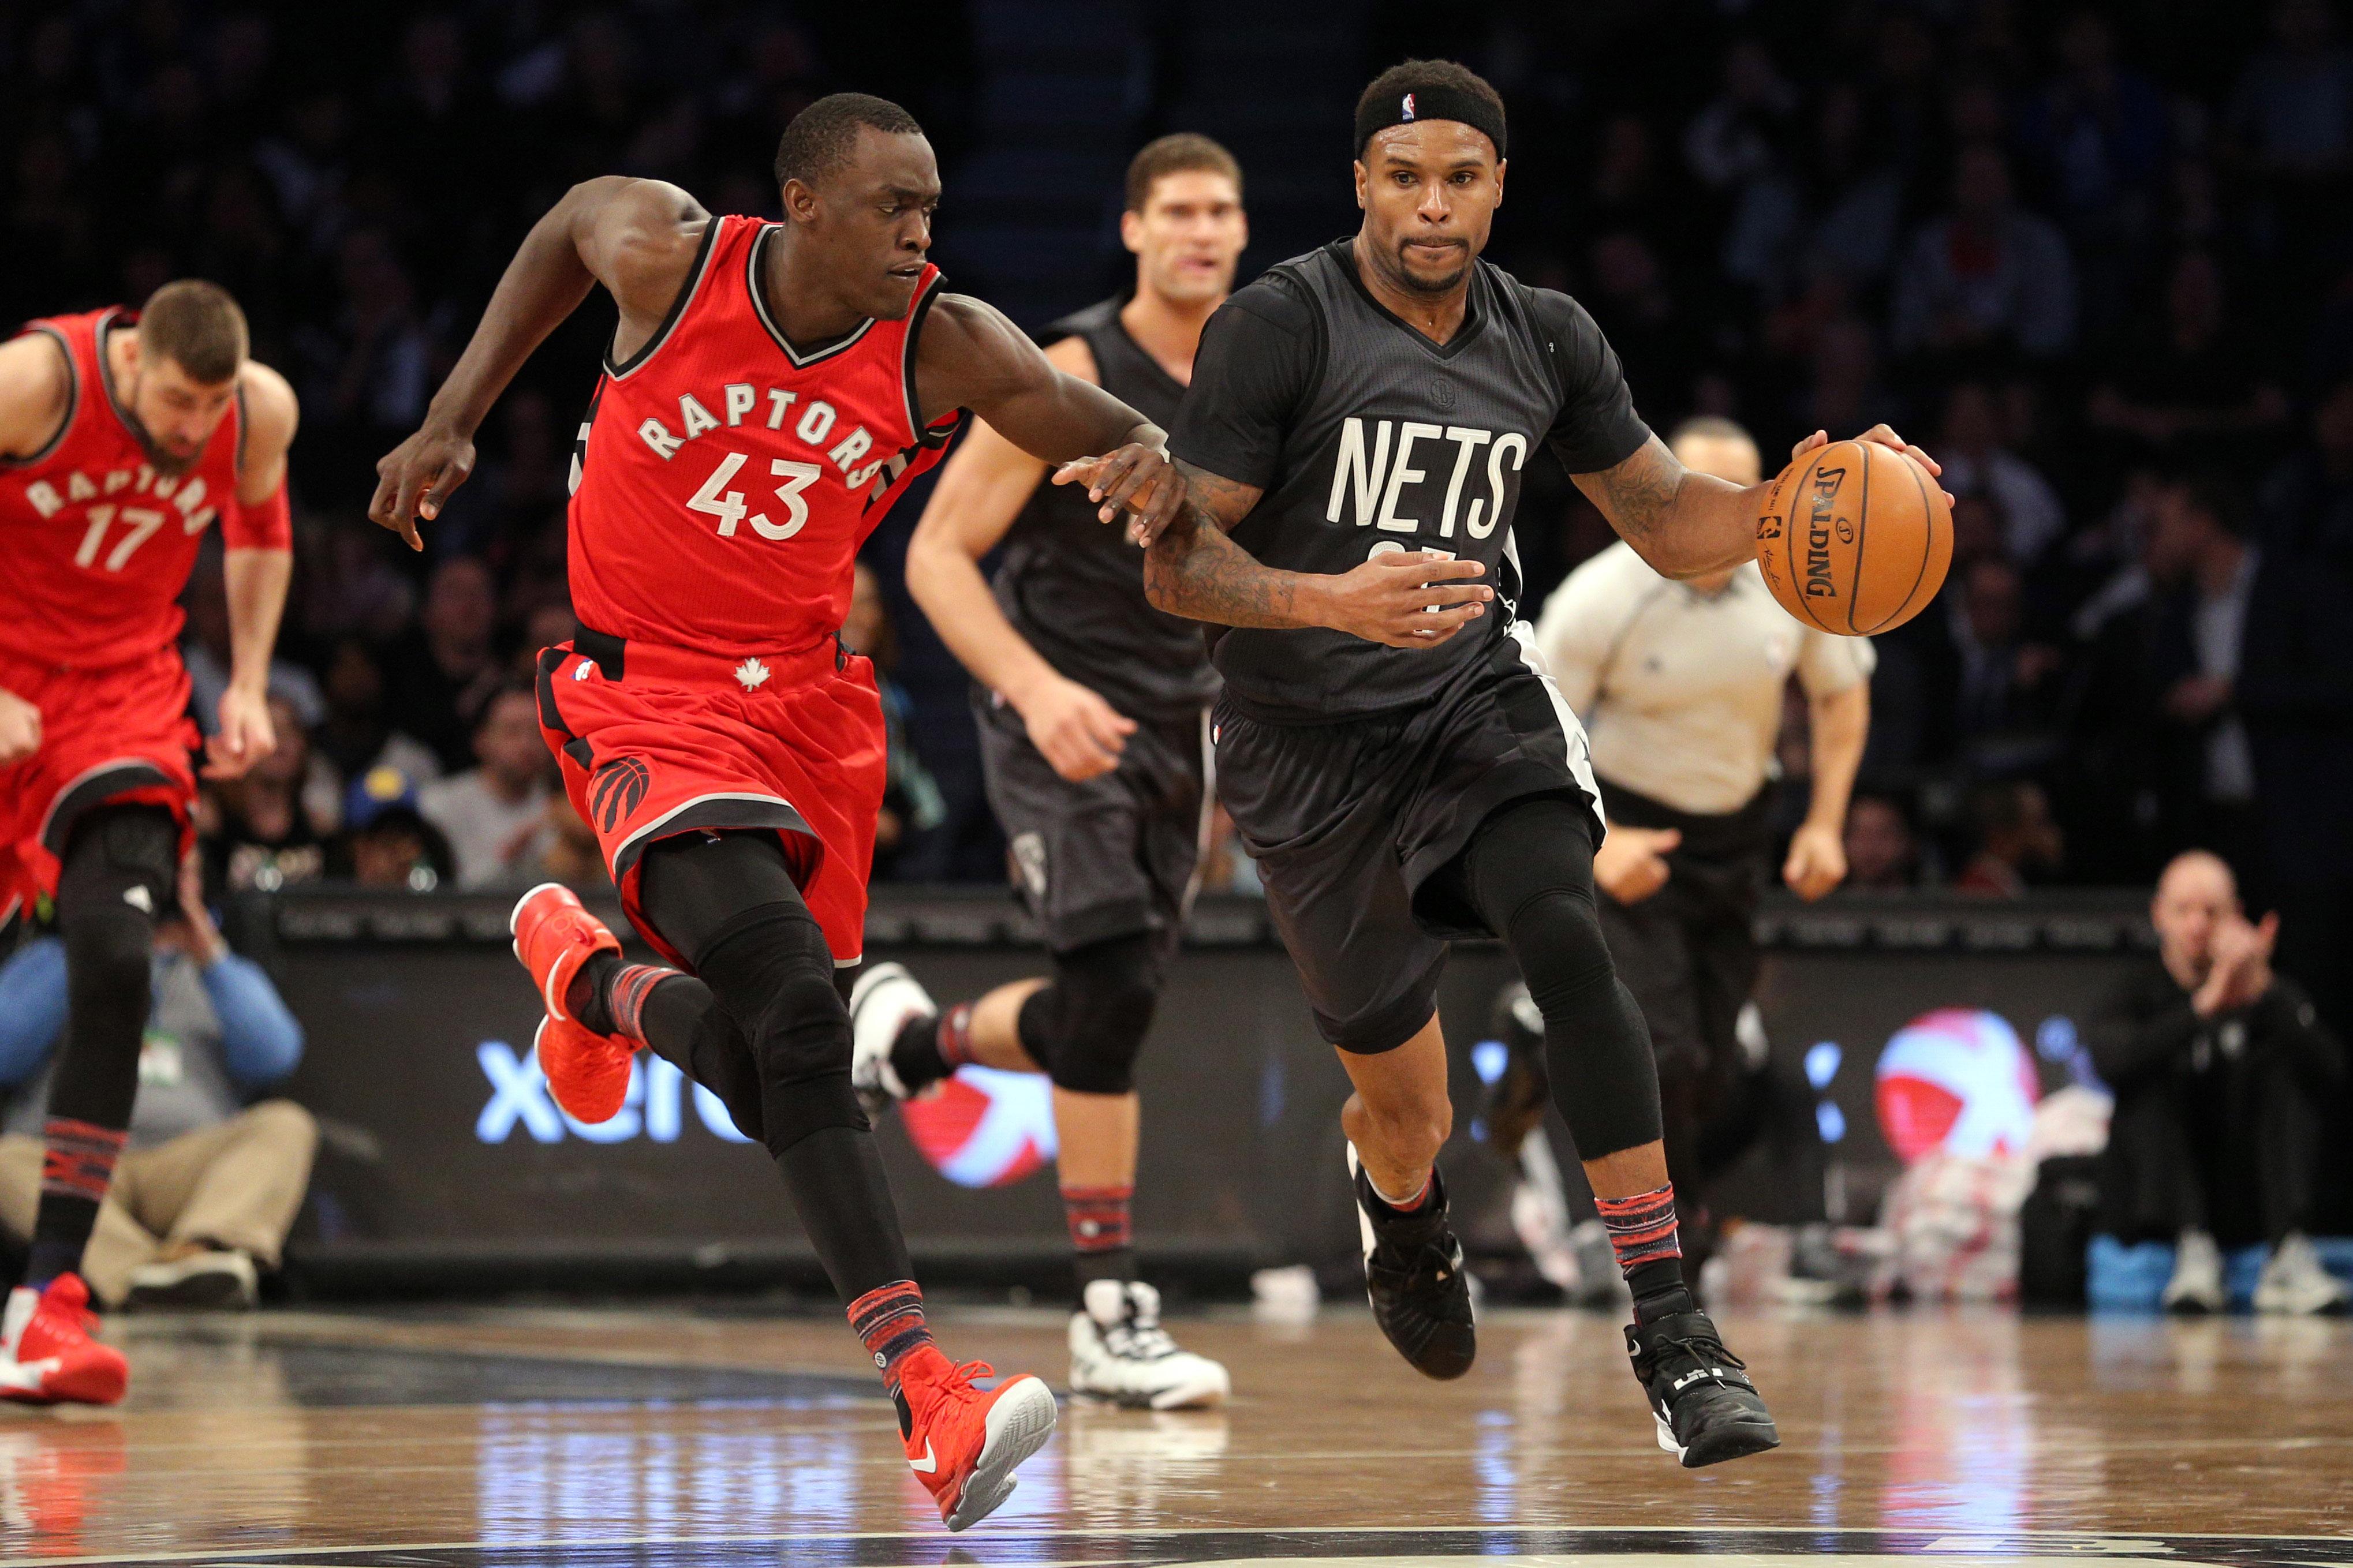 Raptors: Brooklyn Nets Vs. Toronto Raptors Takeaways And Grades